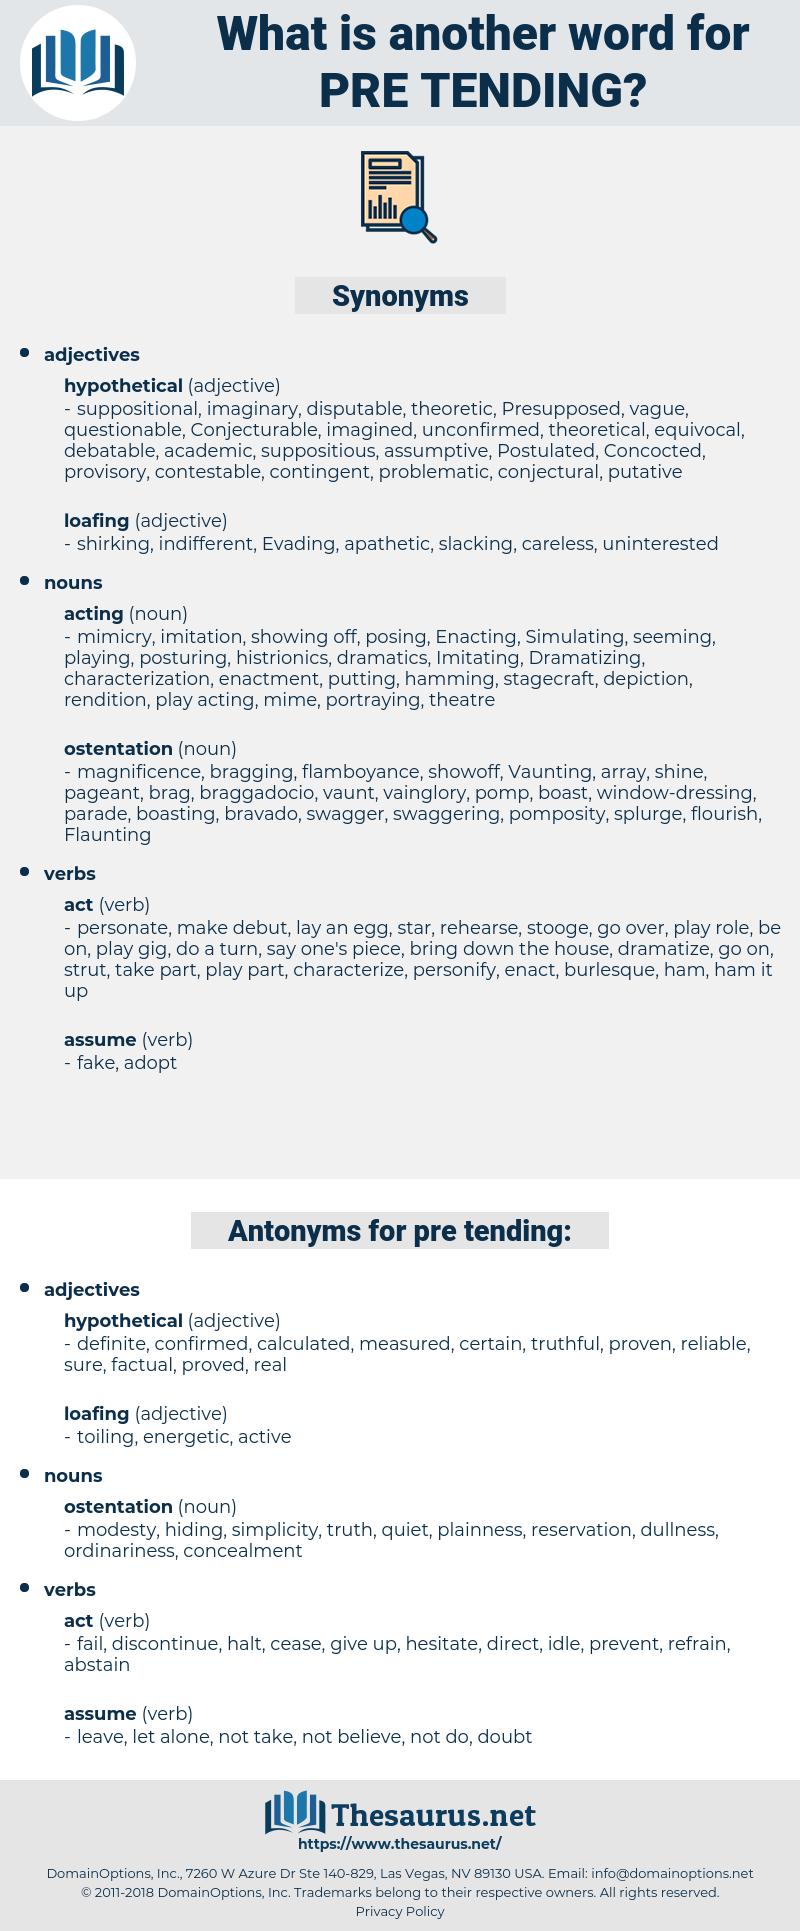 pre-tending, synonym pre-tending, another word for pre-tending, words like pre-tending, thesaurus pre-tending